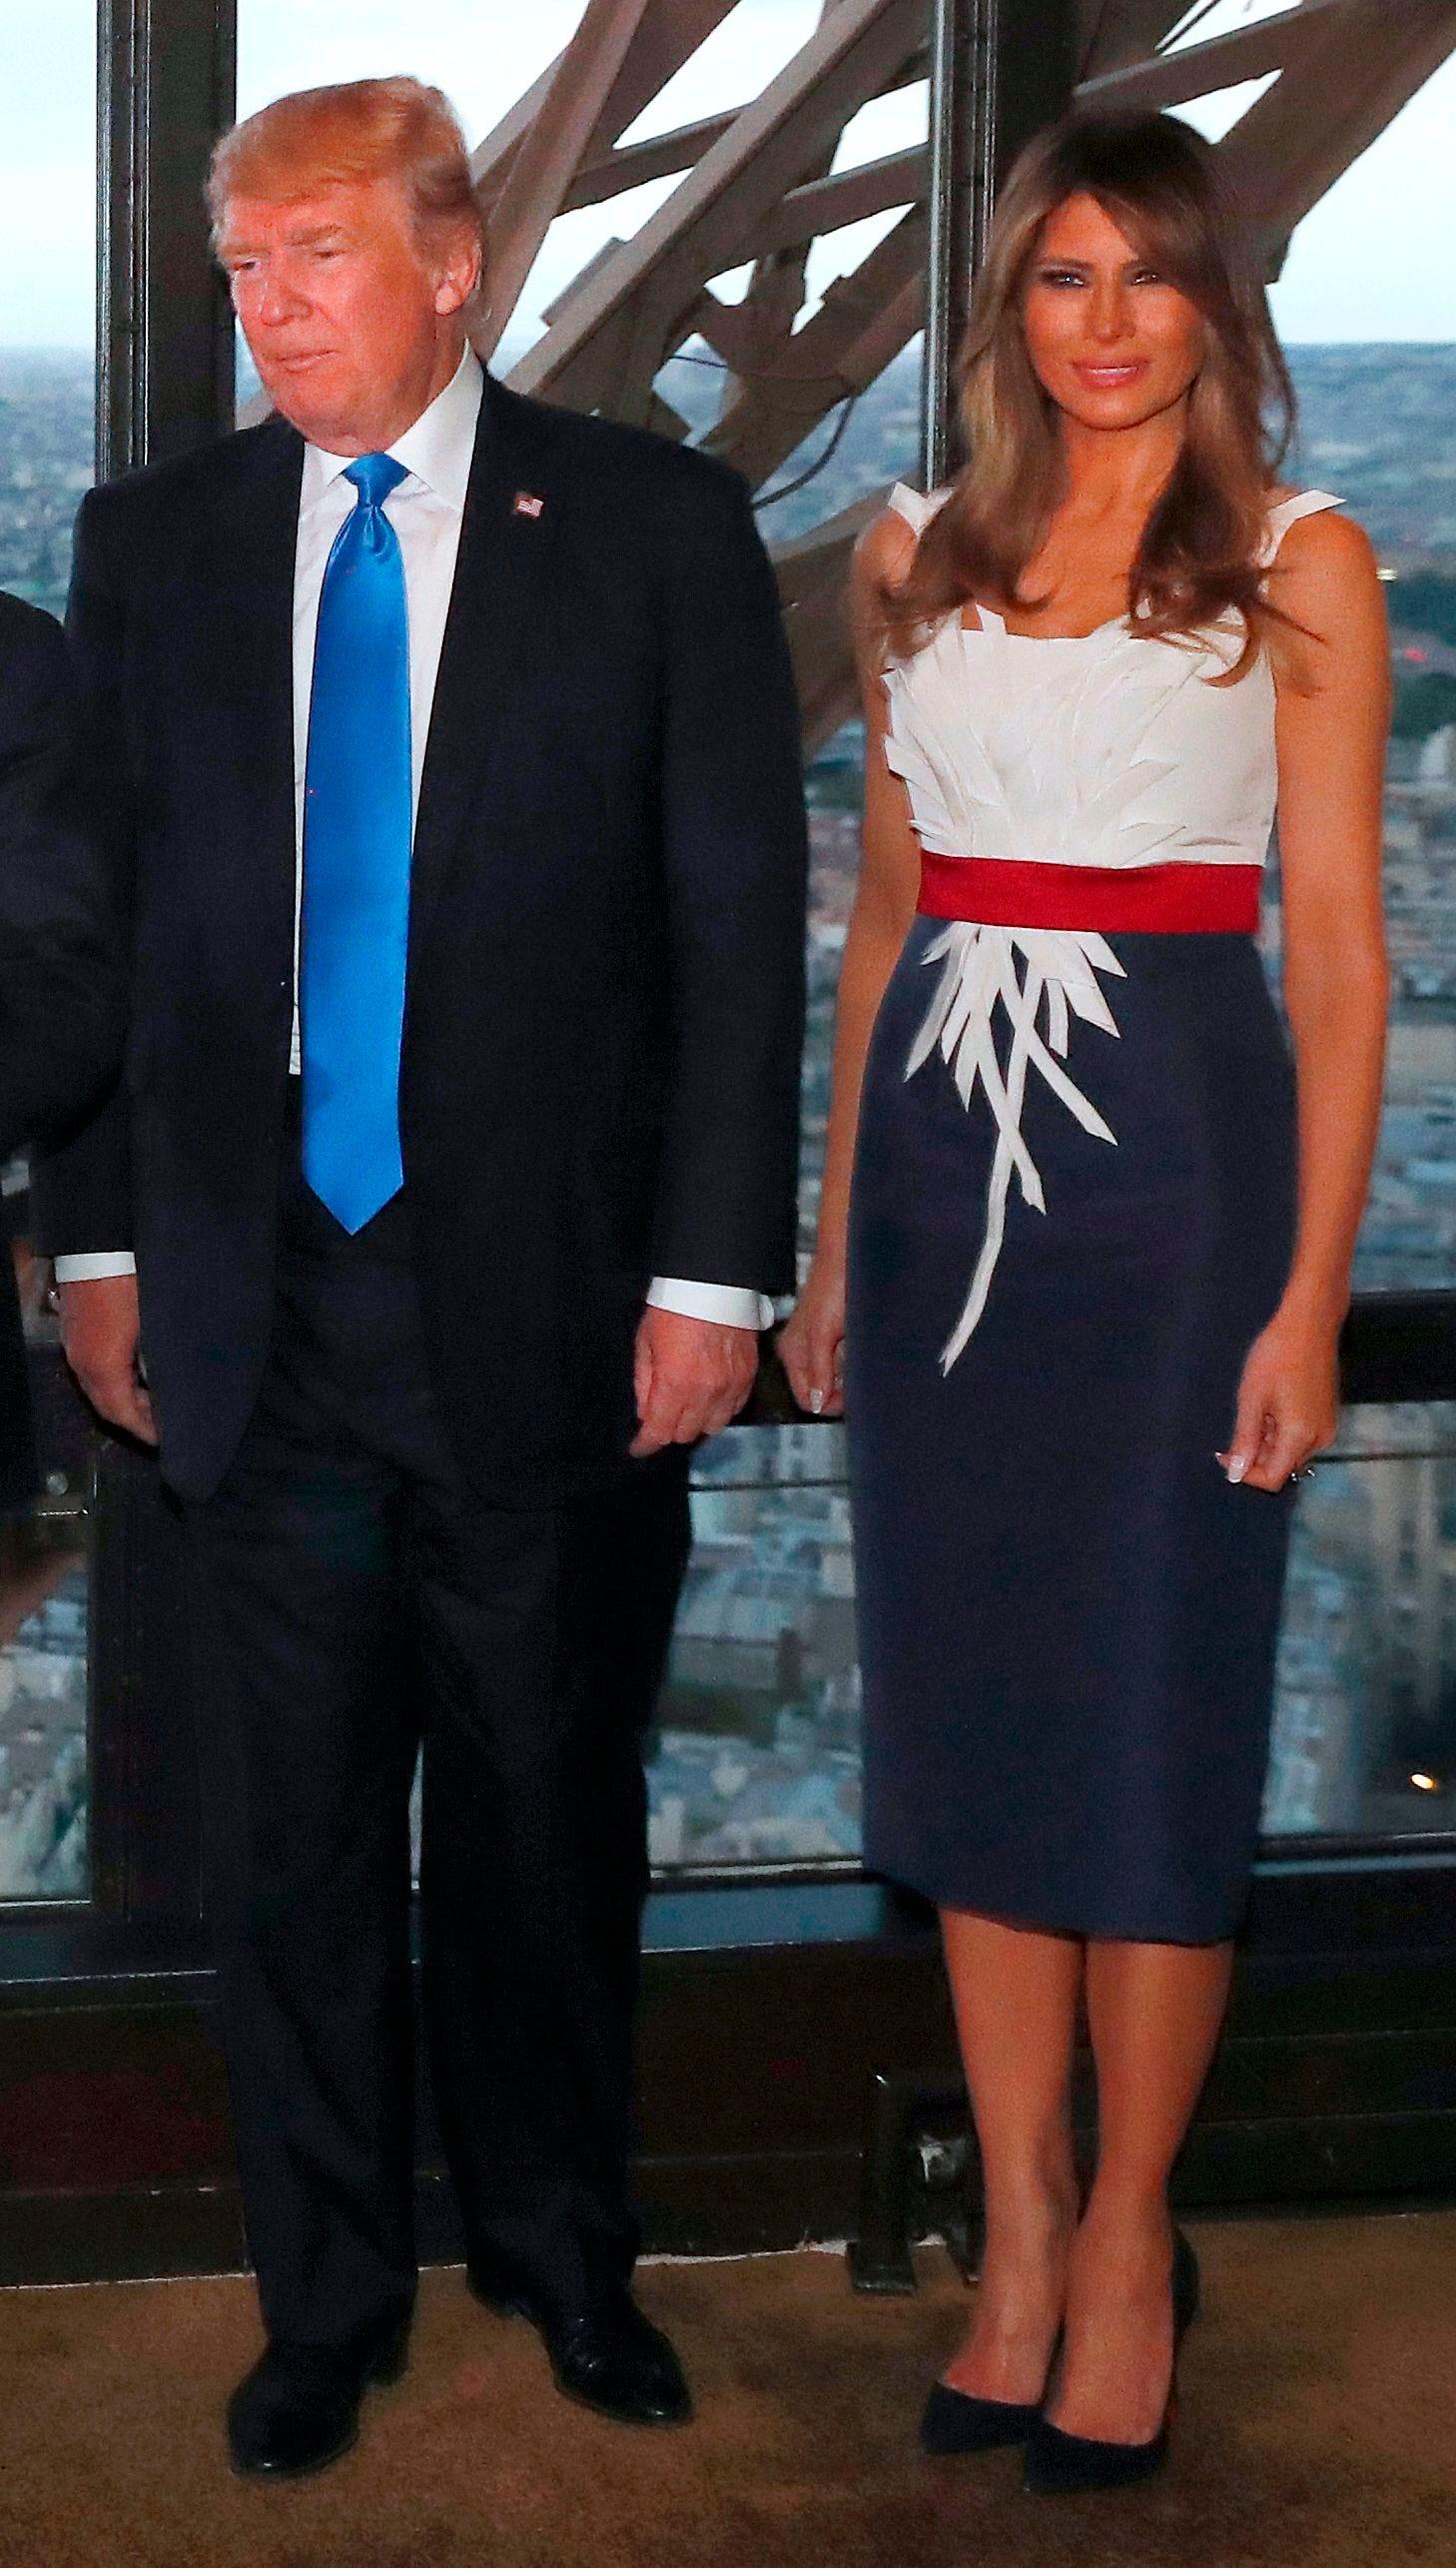 Melania Trump continues fashion tour de force at Eiffel Tower dinner